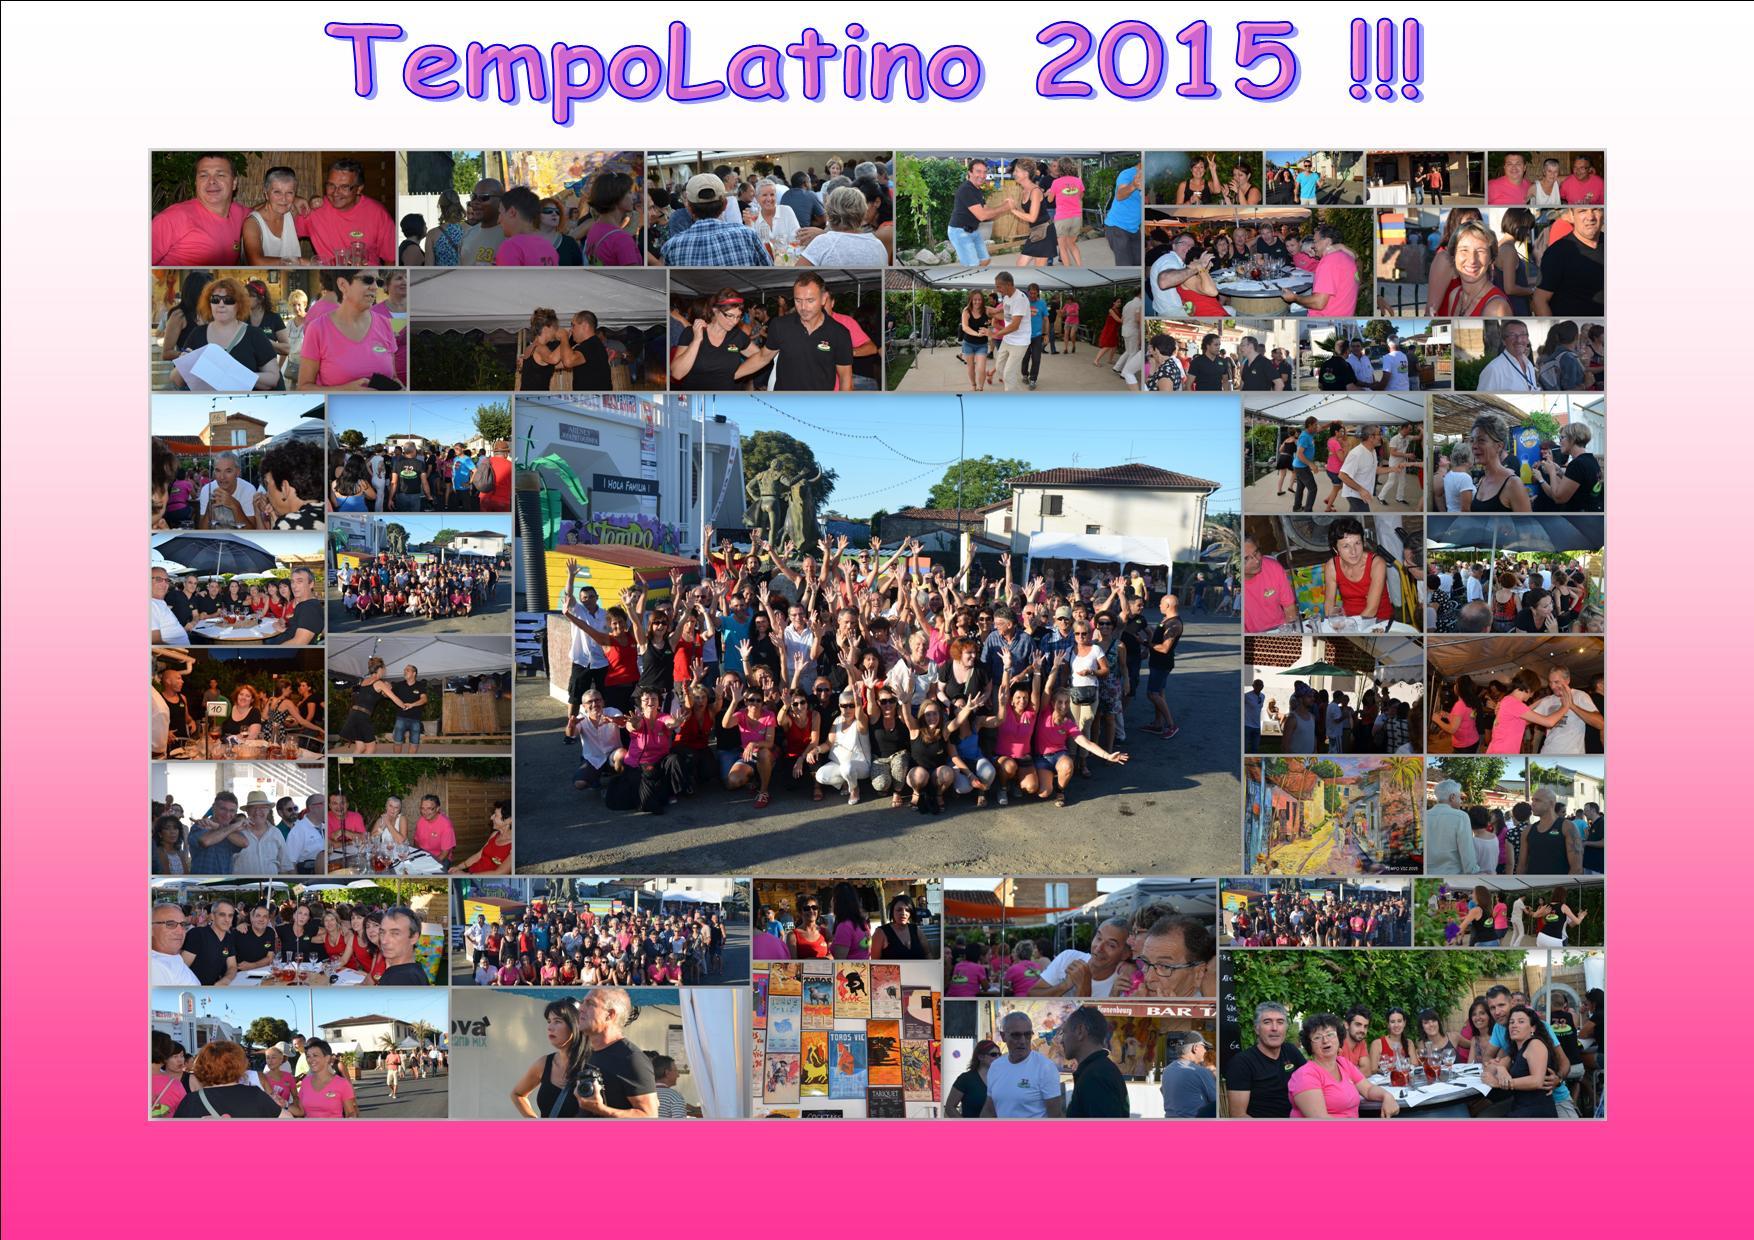 La32 - TempoLatino 2015